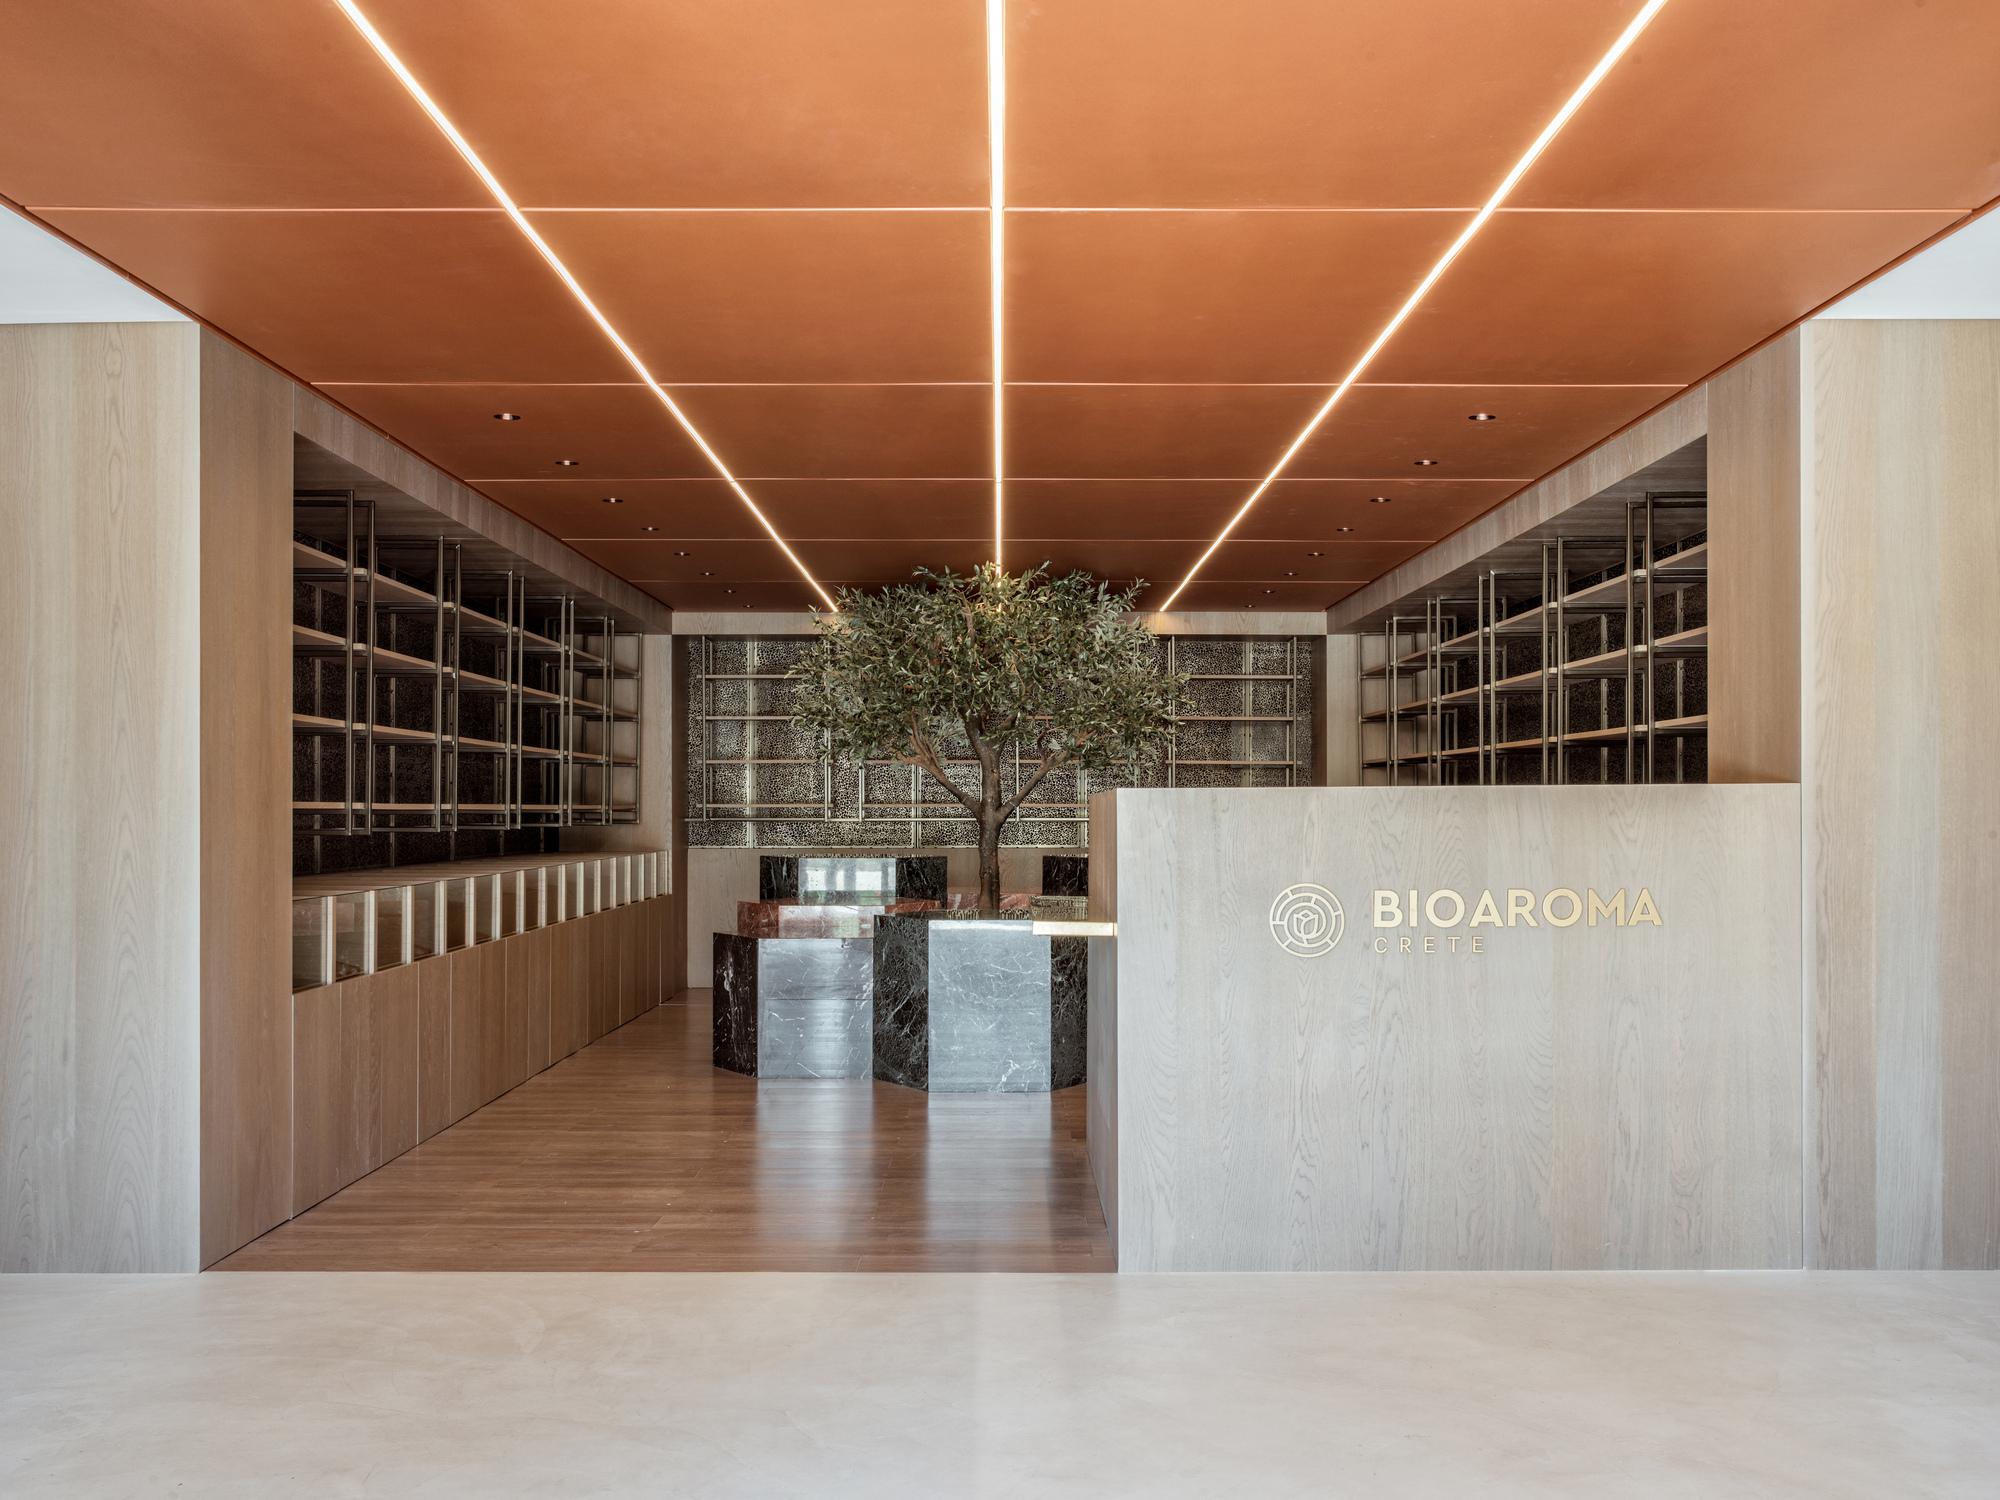 Bioaroma Museum & Experince Store / KAAF | Kitriniaris Associates Architecture Firm